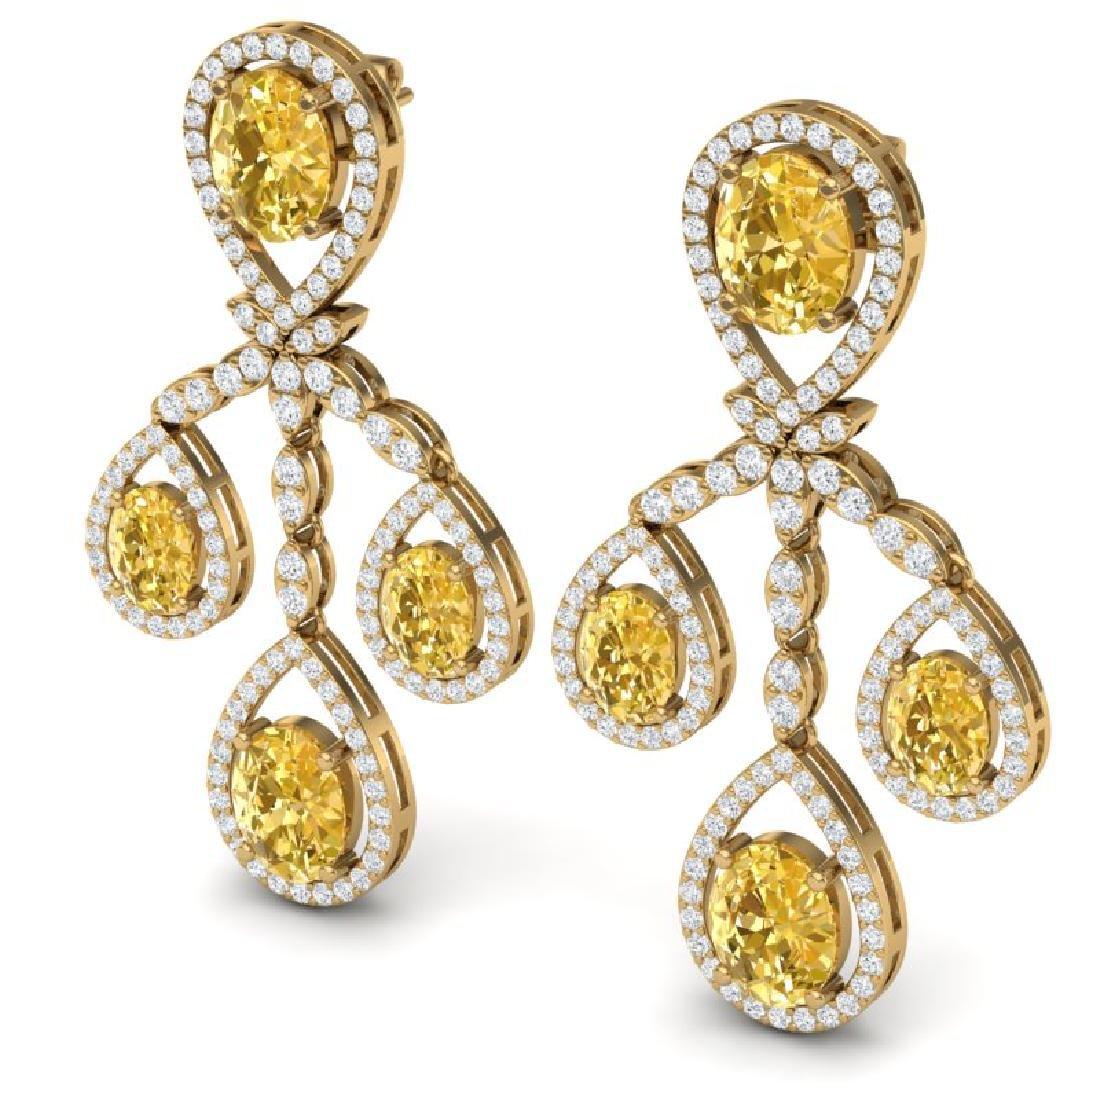 20.69 CTW Royalty Canary Citrine & VS Diamond Earrings - 2